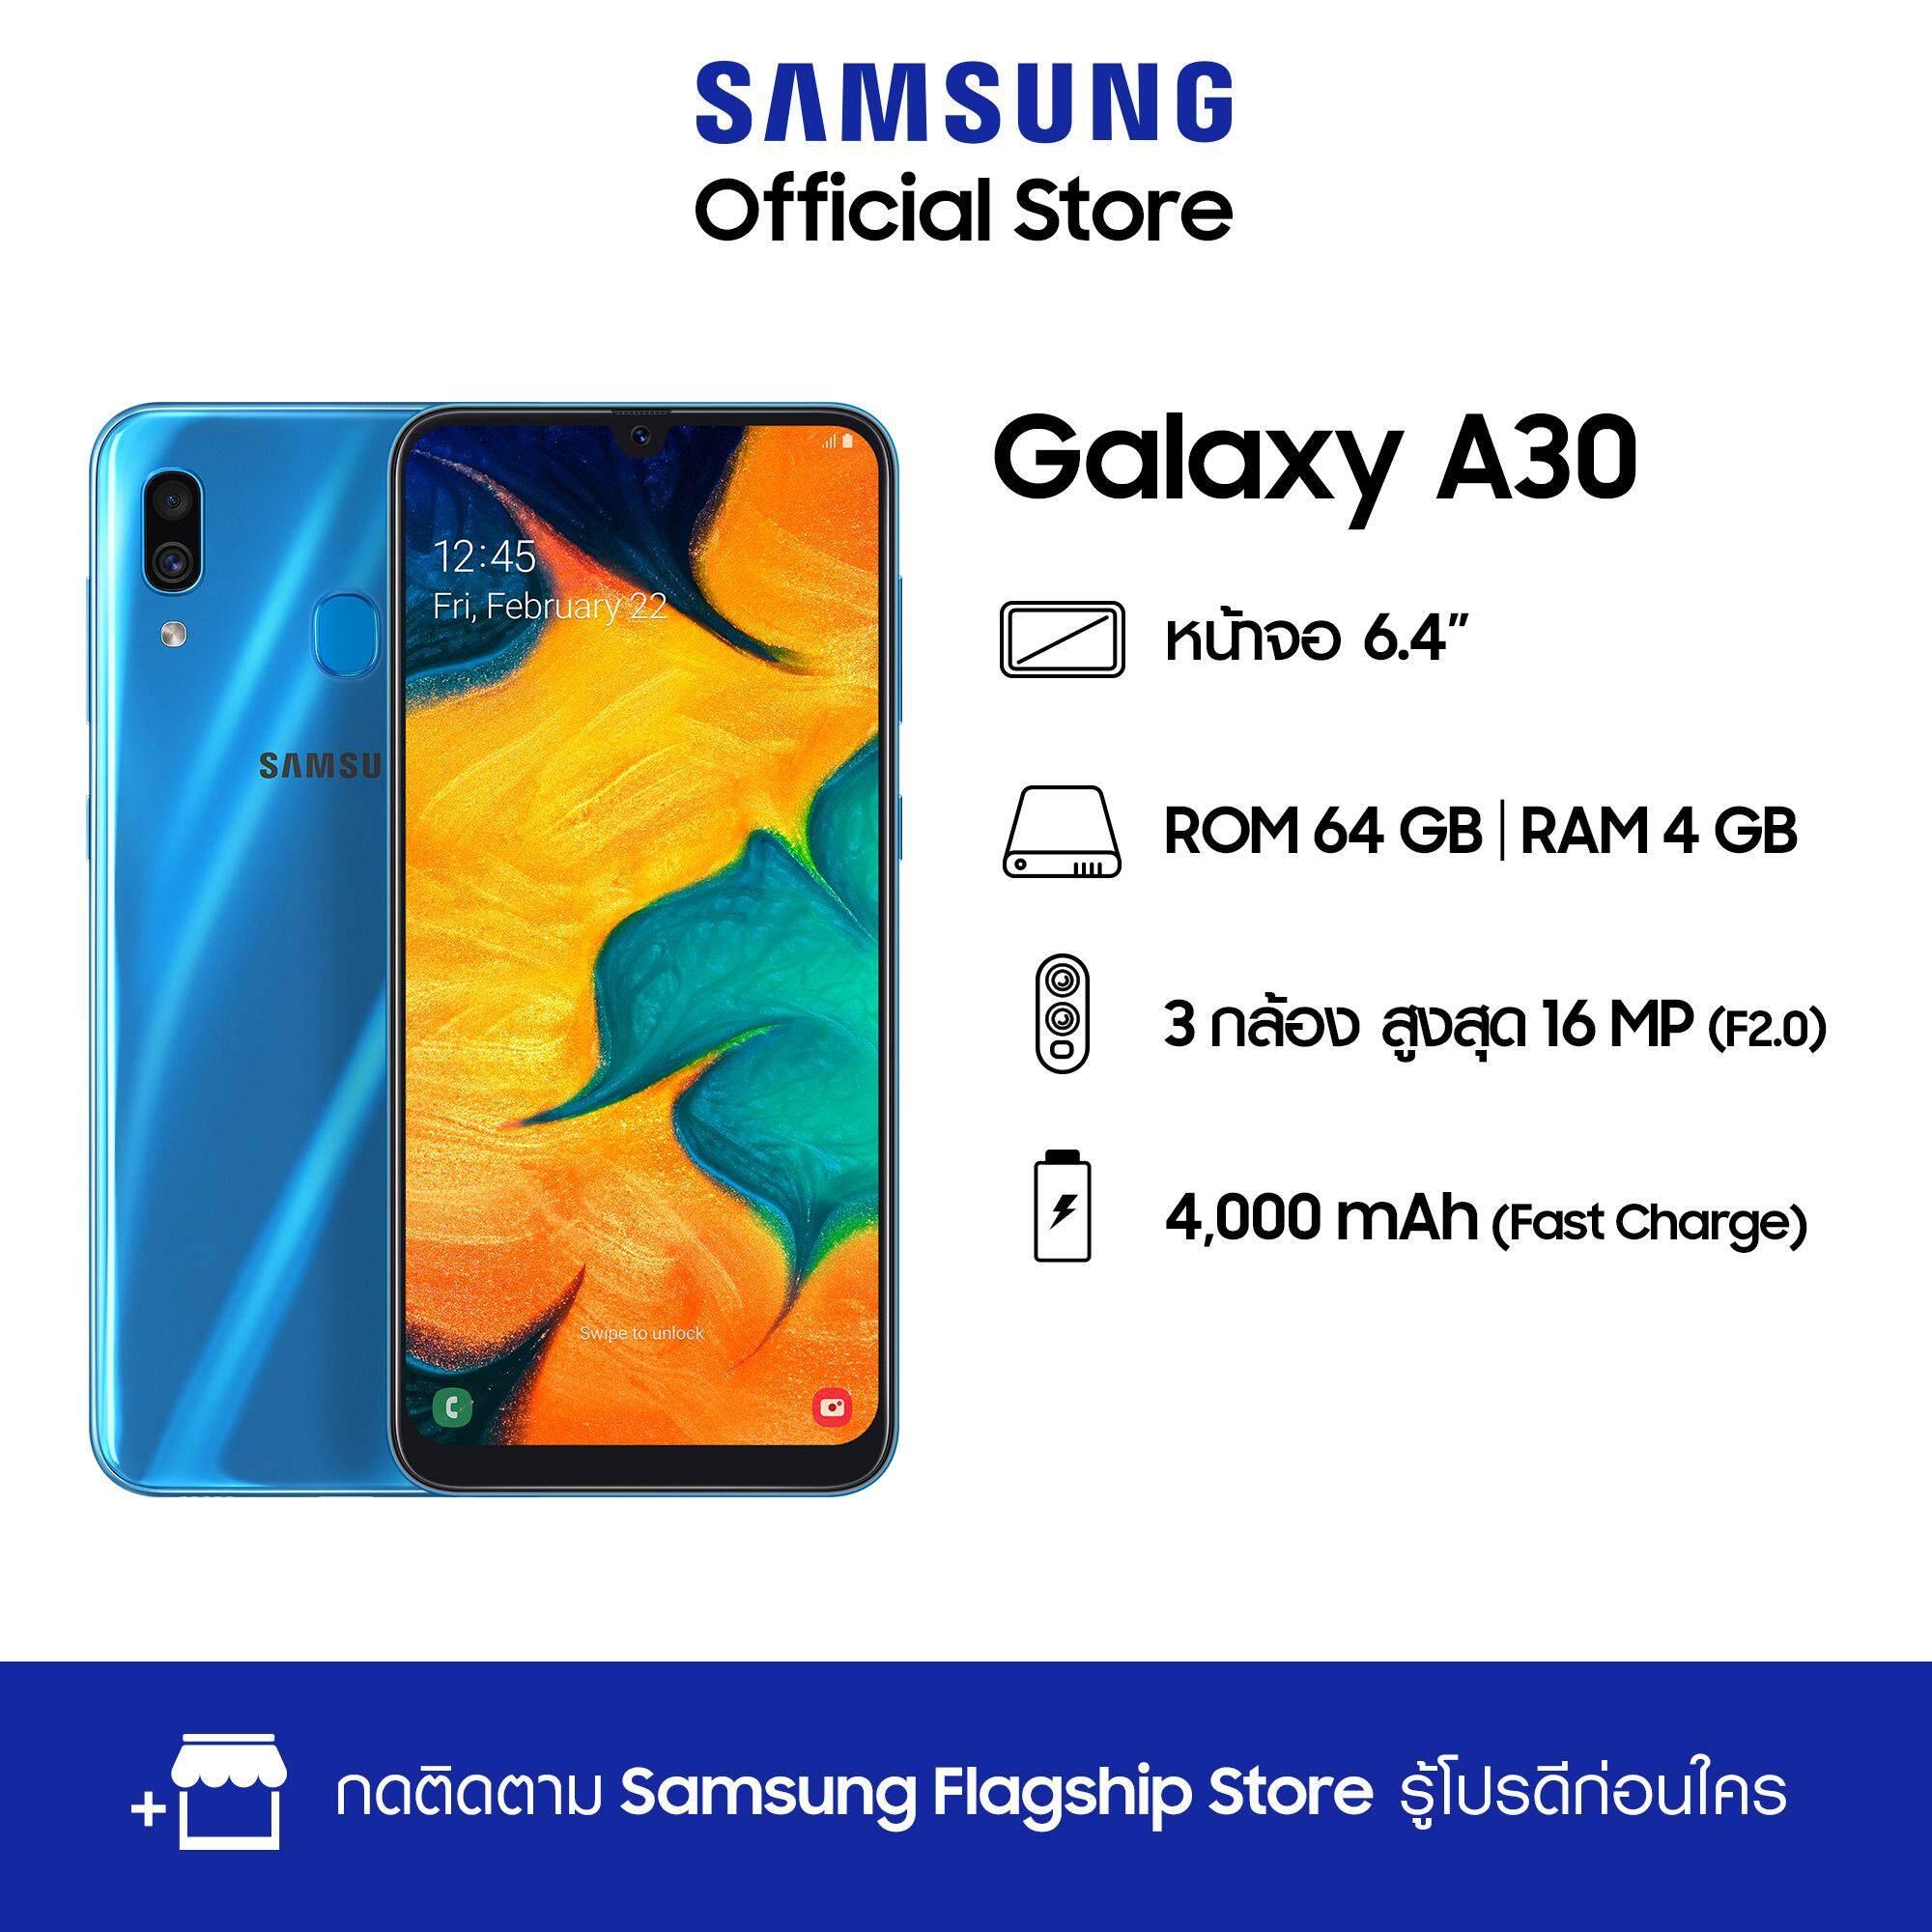 Samsung Galaxy A30 4 GB RAM 64 GB ROM 6.4 นิ้ว 3 กล้อง สูงสุด 16 MP FF (F2.0) - โทรศัพท์มือถือ ดีลเด็ด! samsung galaxy a30 จอ amoled แบตอึด แฟลชเซลเพียง 5,931.- - ดีลเด็ด! Samsung Galaxy A30 จอ AMOLED แบตอึด แฟลชเซลเพียง 5,931.-